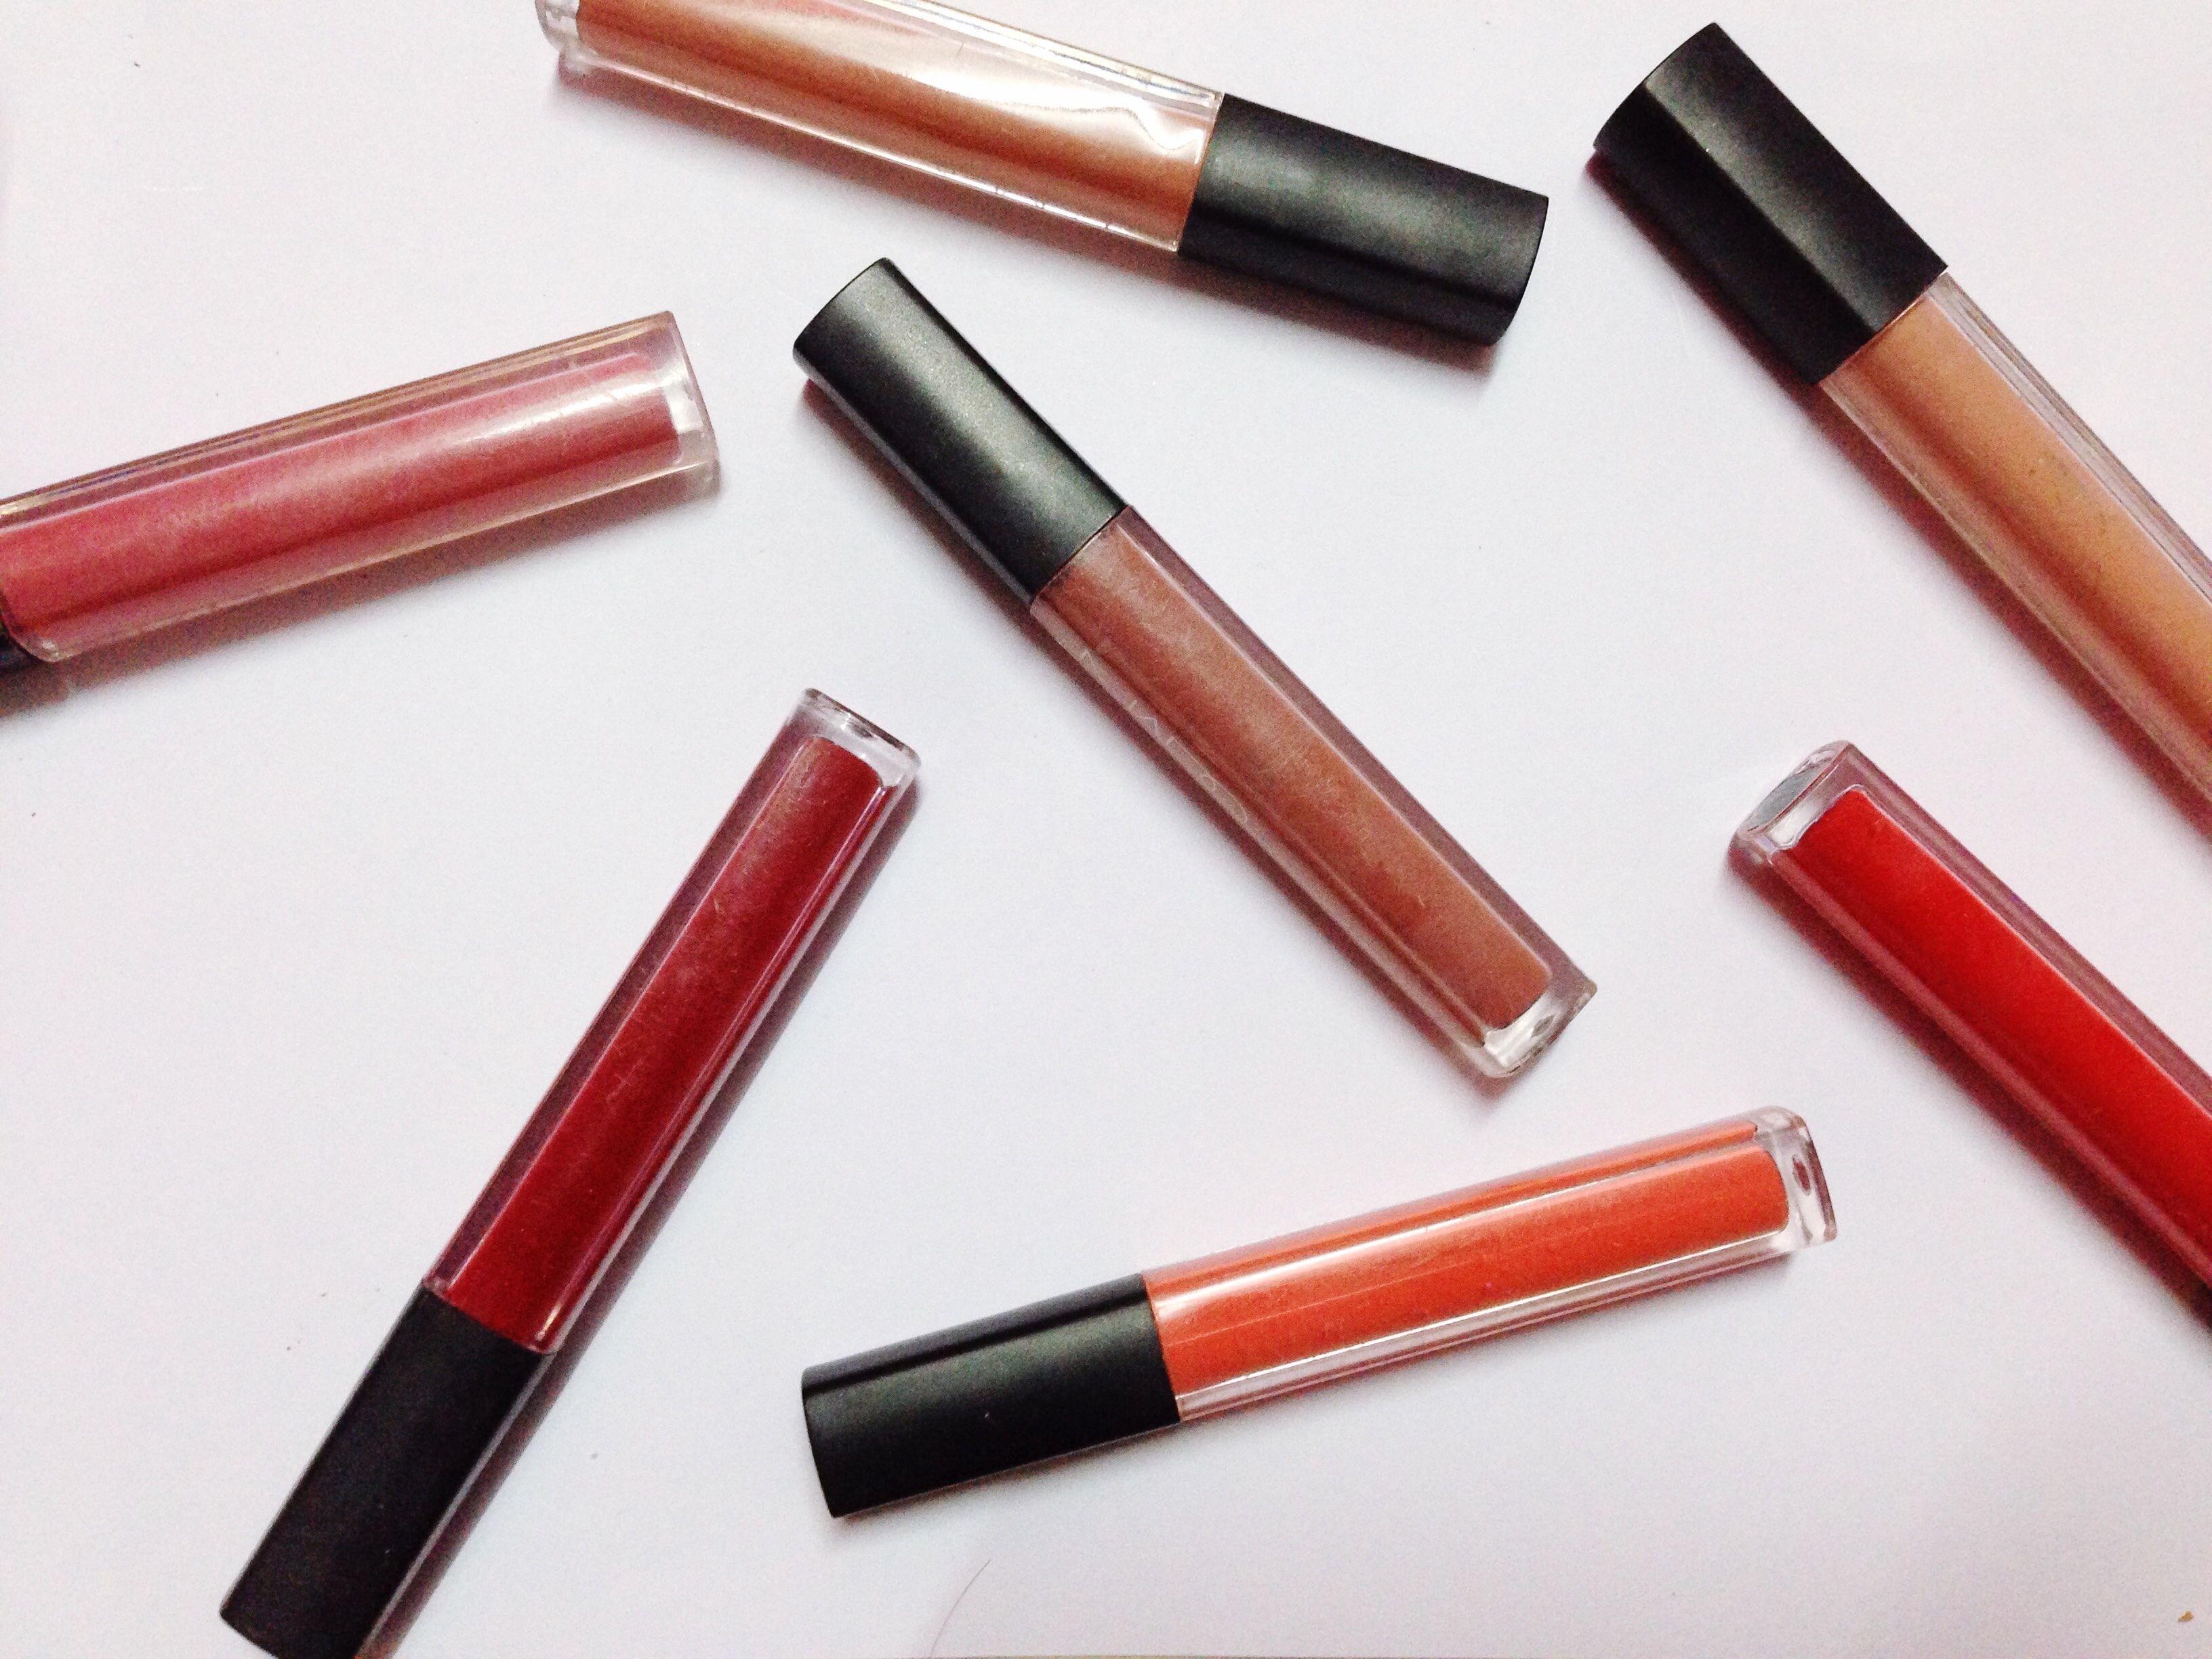 11 of the best liquid lipsticks